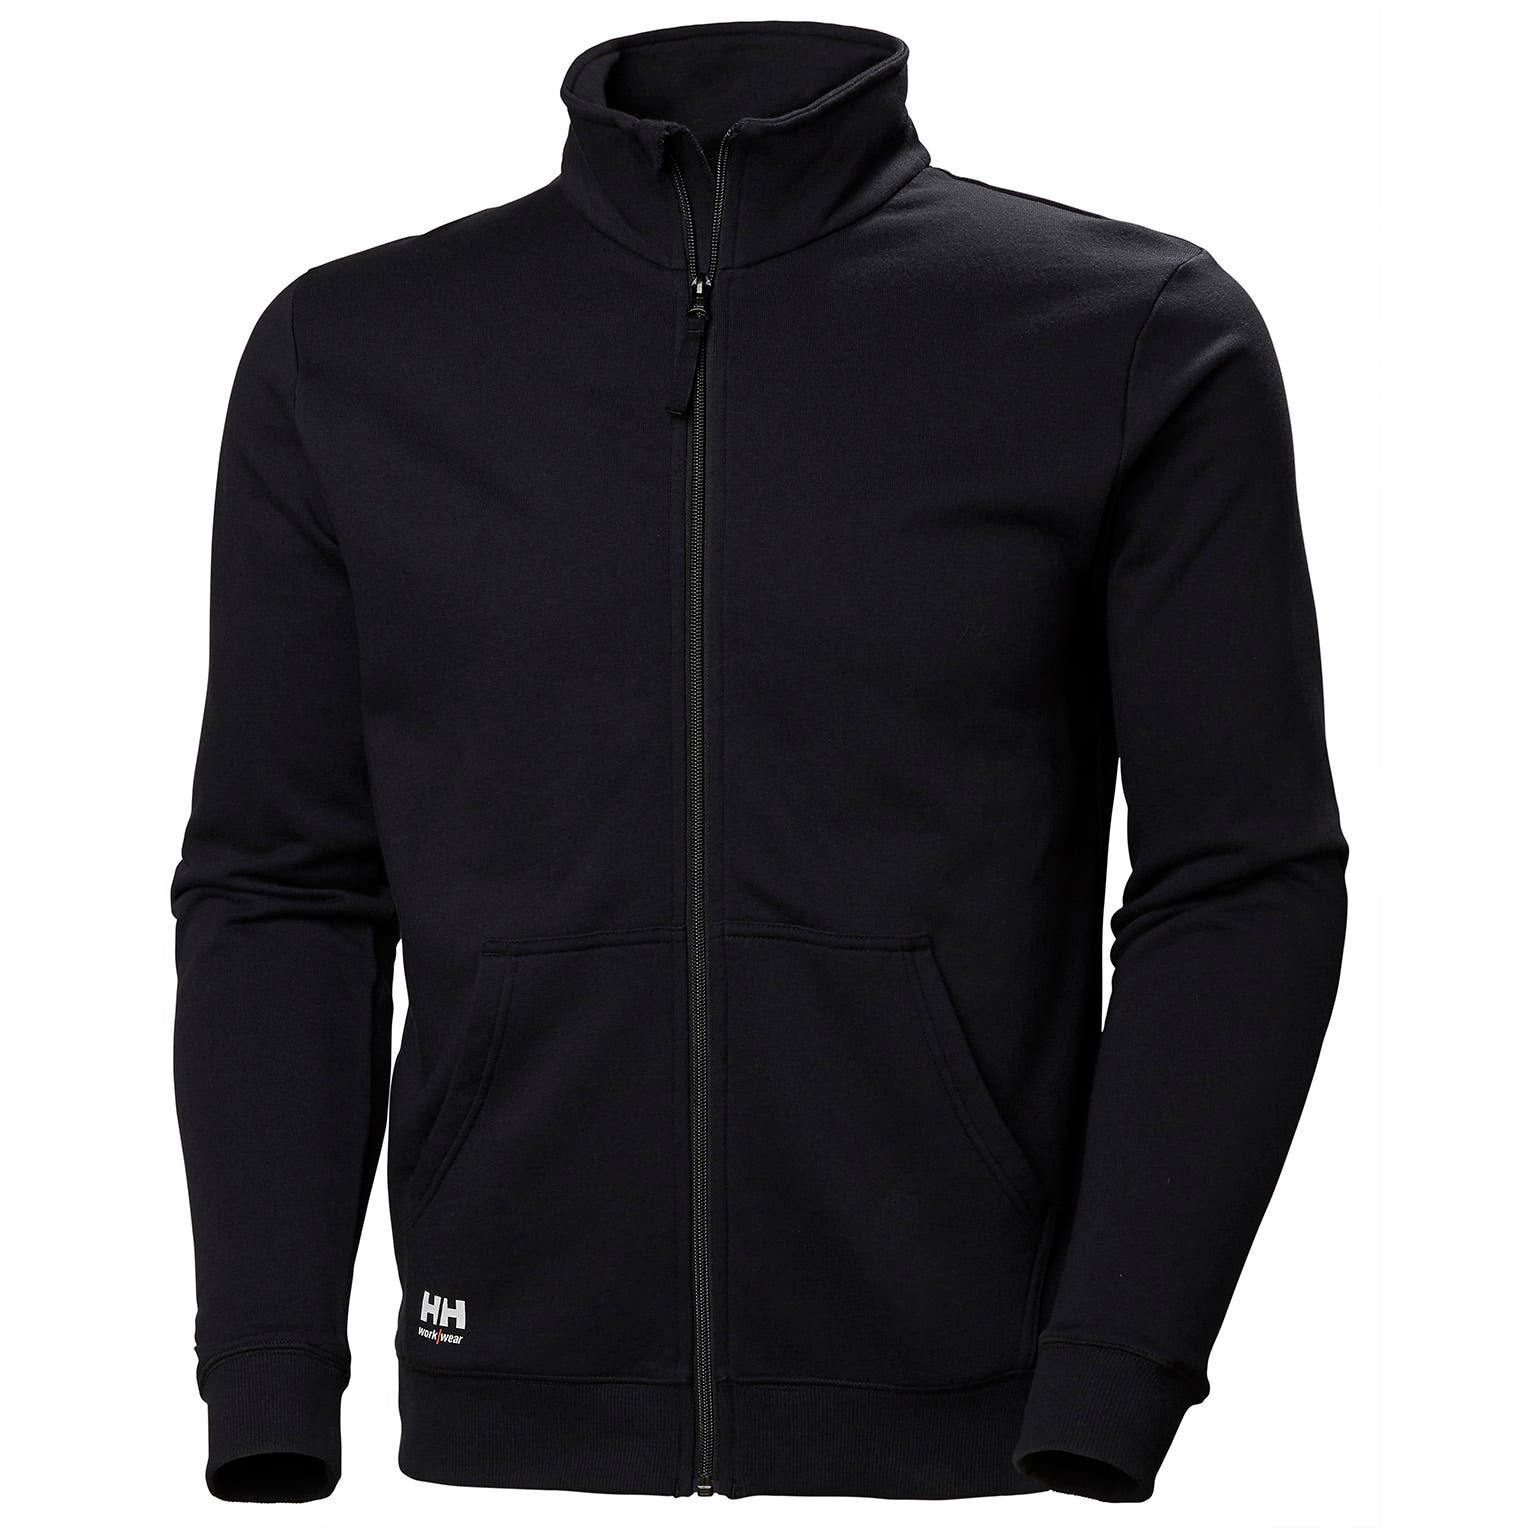 Свитшот на молнии Helly Hansen Manchester Zip Sweatshirt - 79212 (Black; XL)